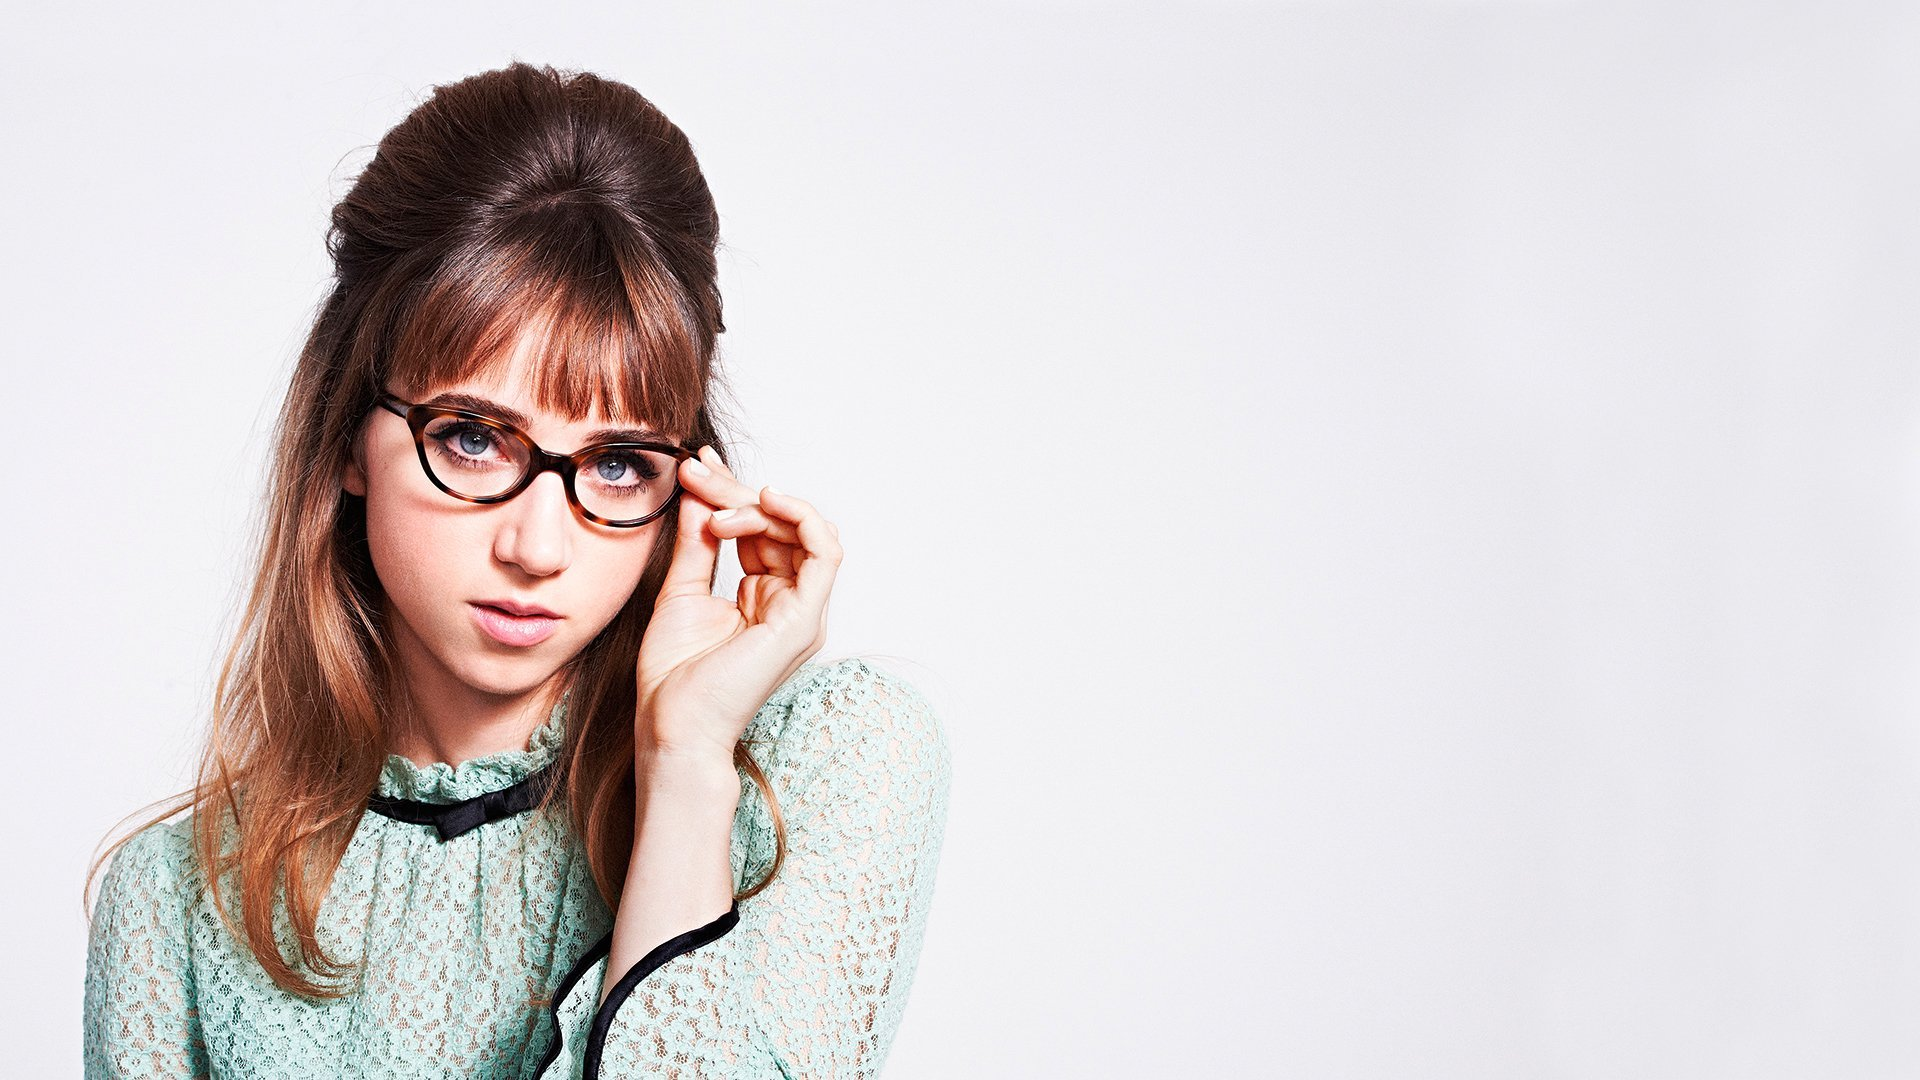 zoe kazan glasses wallpaper 57600